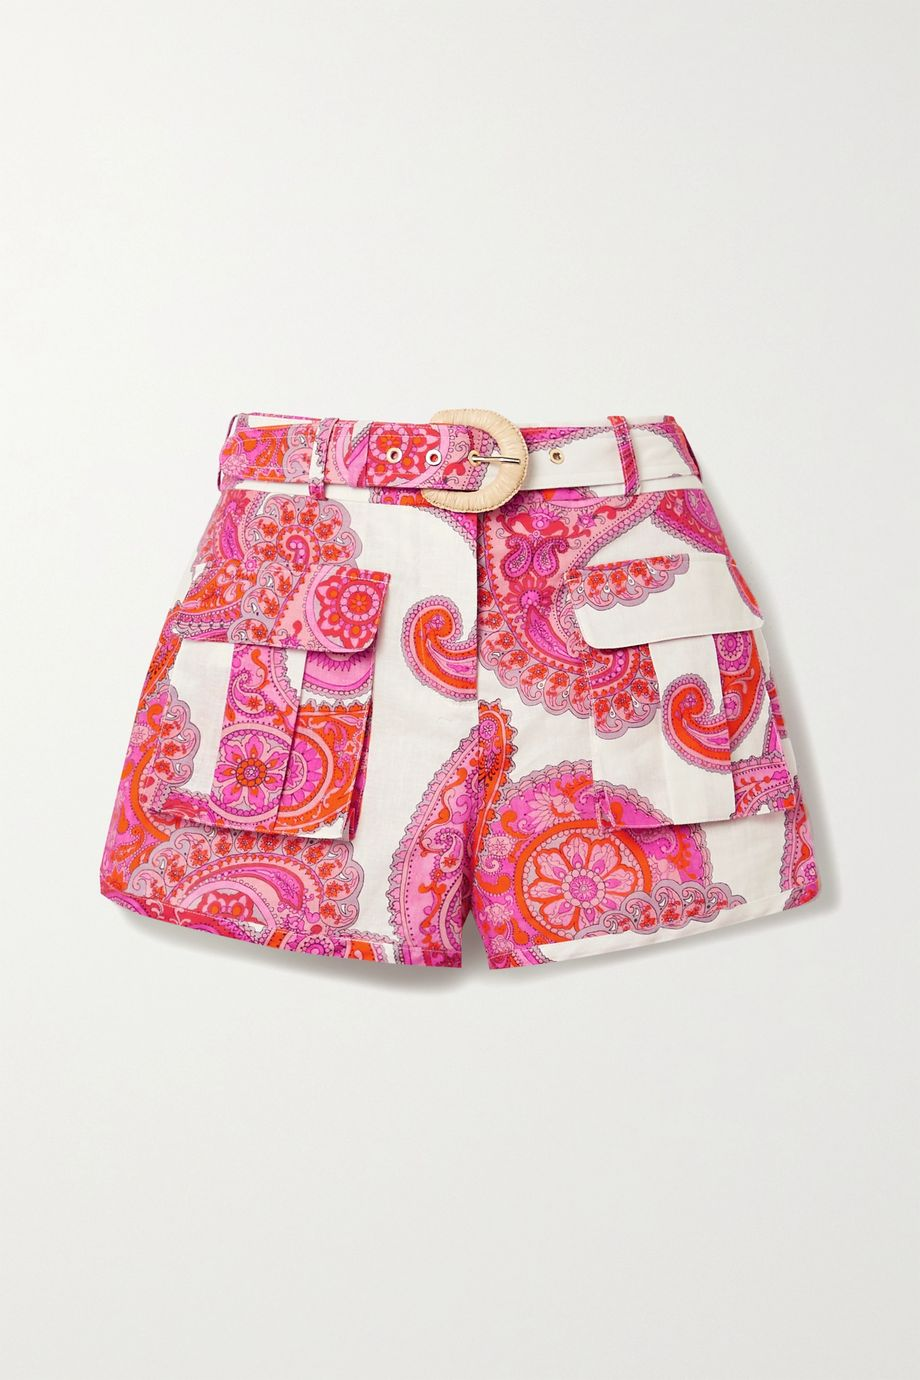 Zimmermann Peggy paisley-print linen and cotton-blend shorts